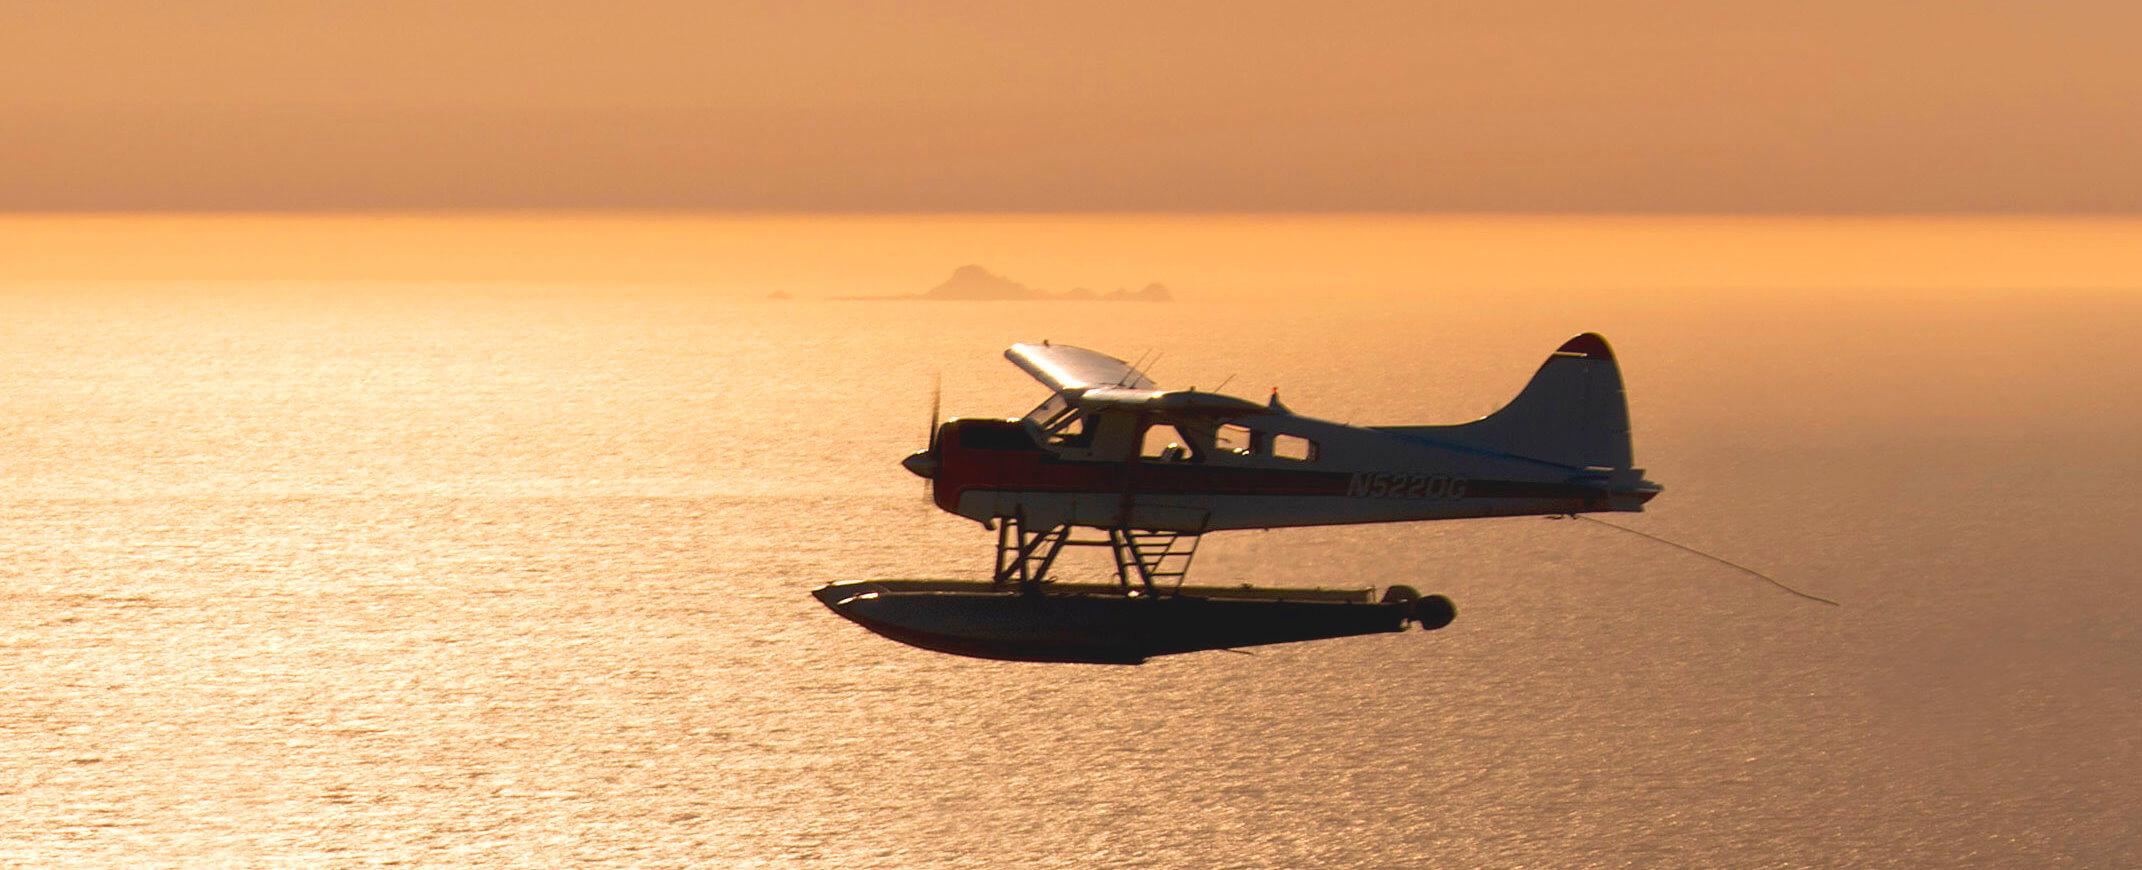 seaplane-tour-sanfrancisco-flights-things-to-do